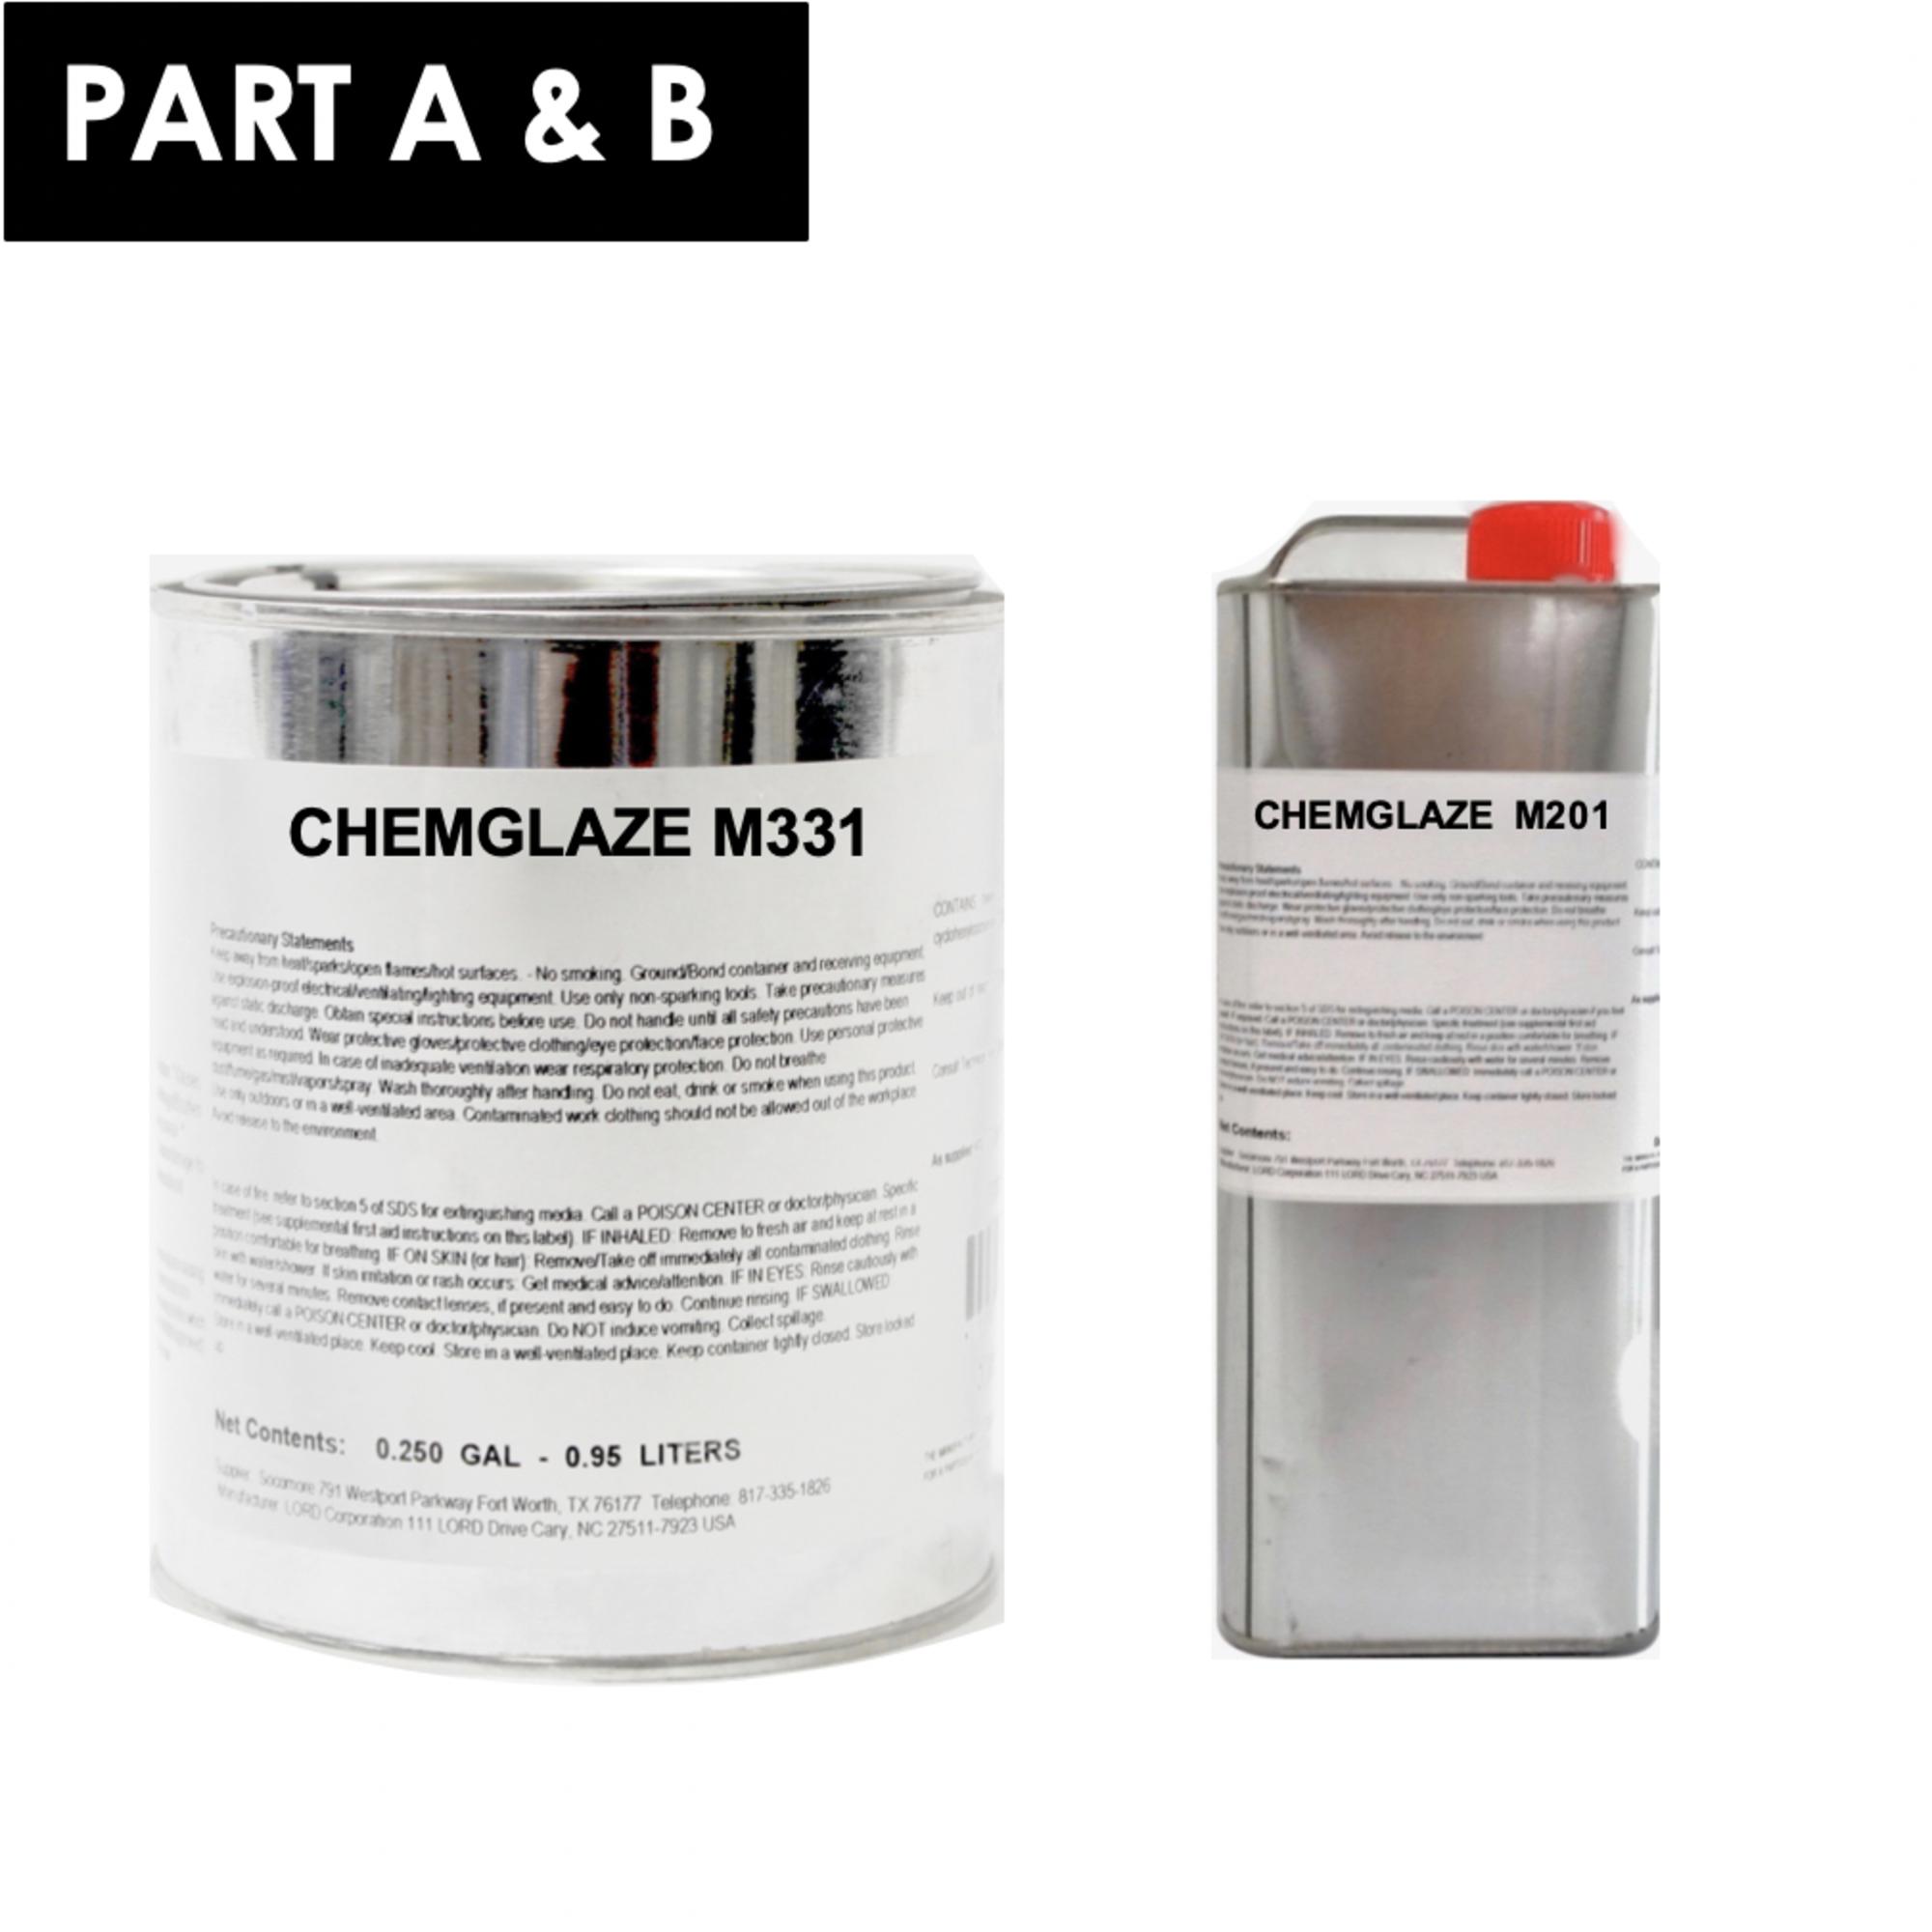 CHEMGLAZE M201 GAL F-STYLE